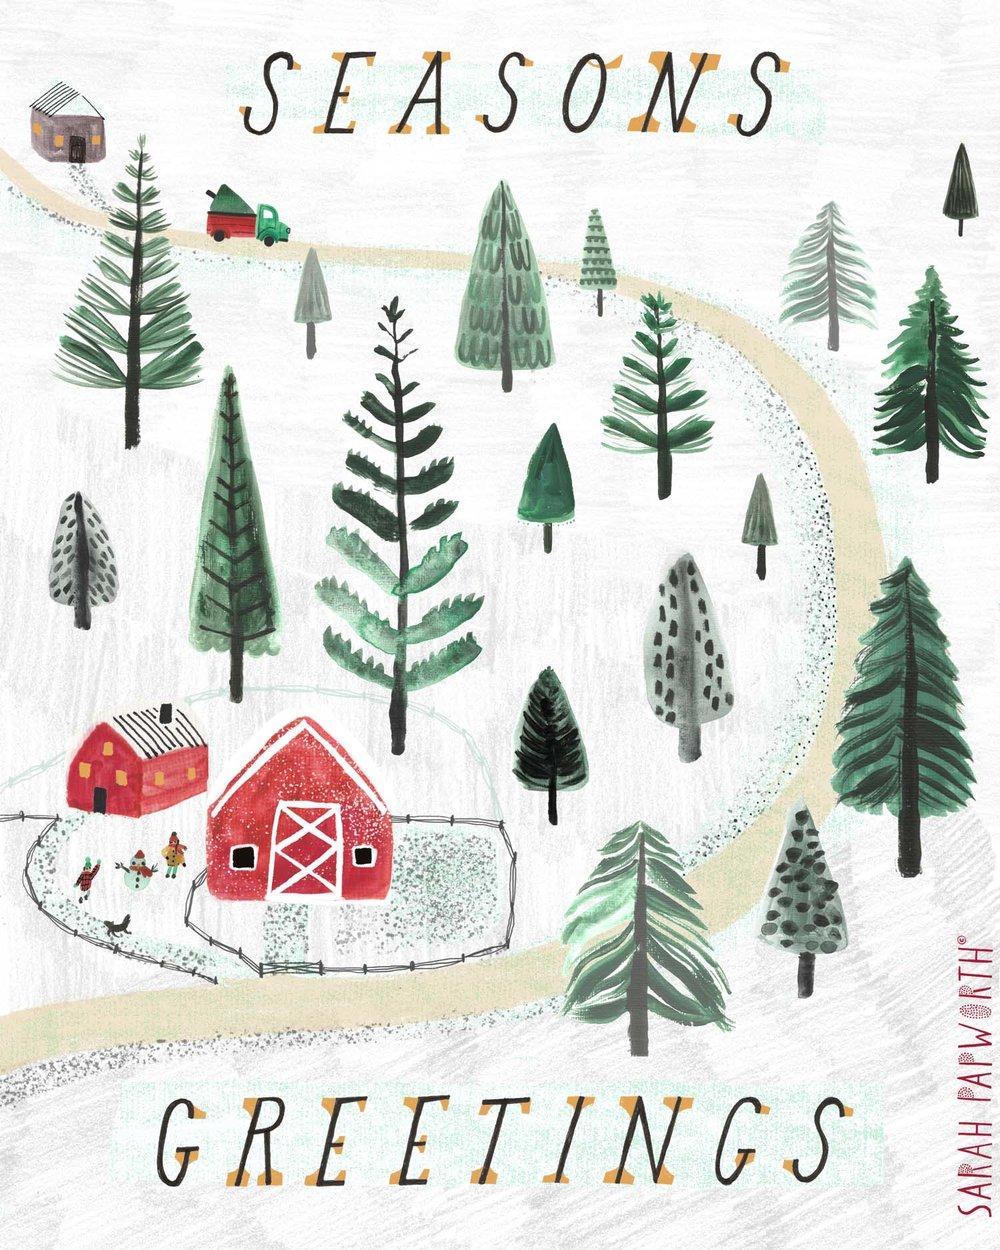 greeting card design christmas snoy scene woodland cabin sarah papworth.jpg